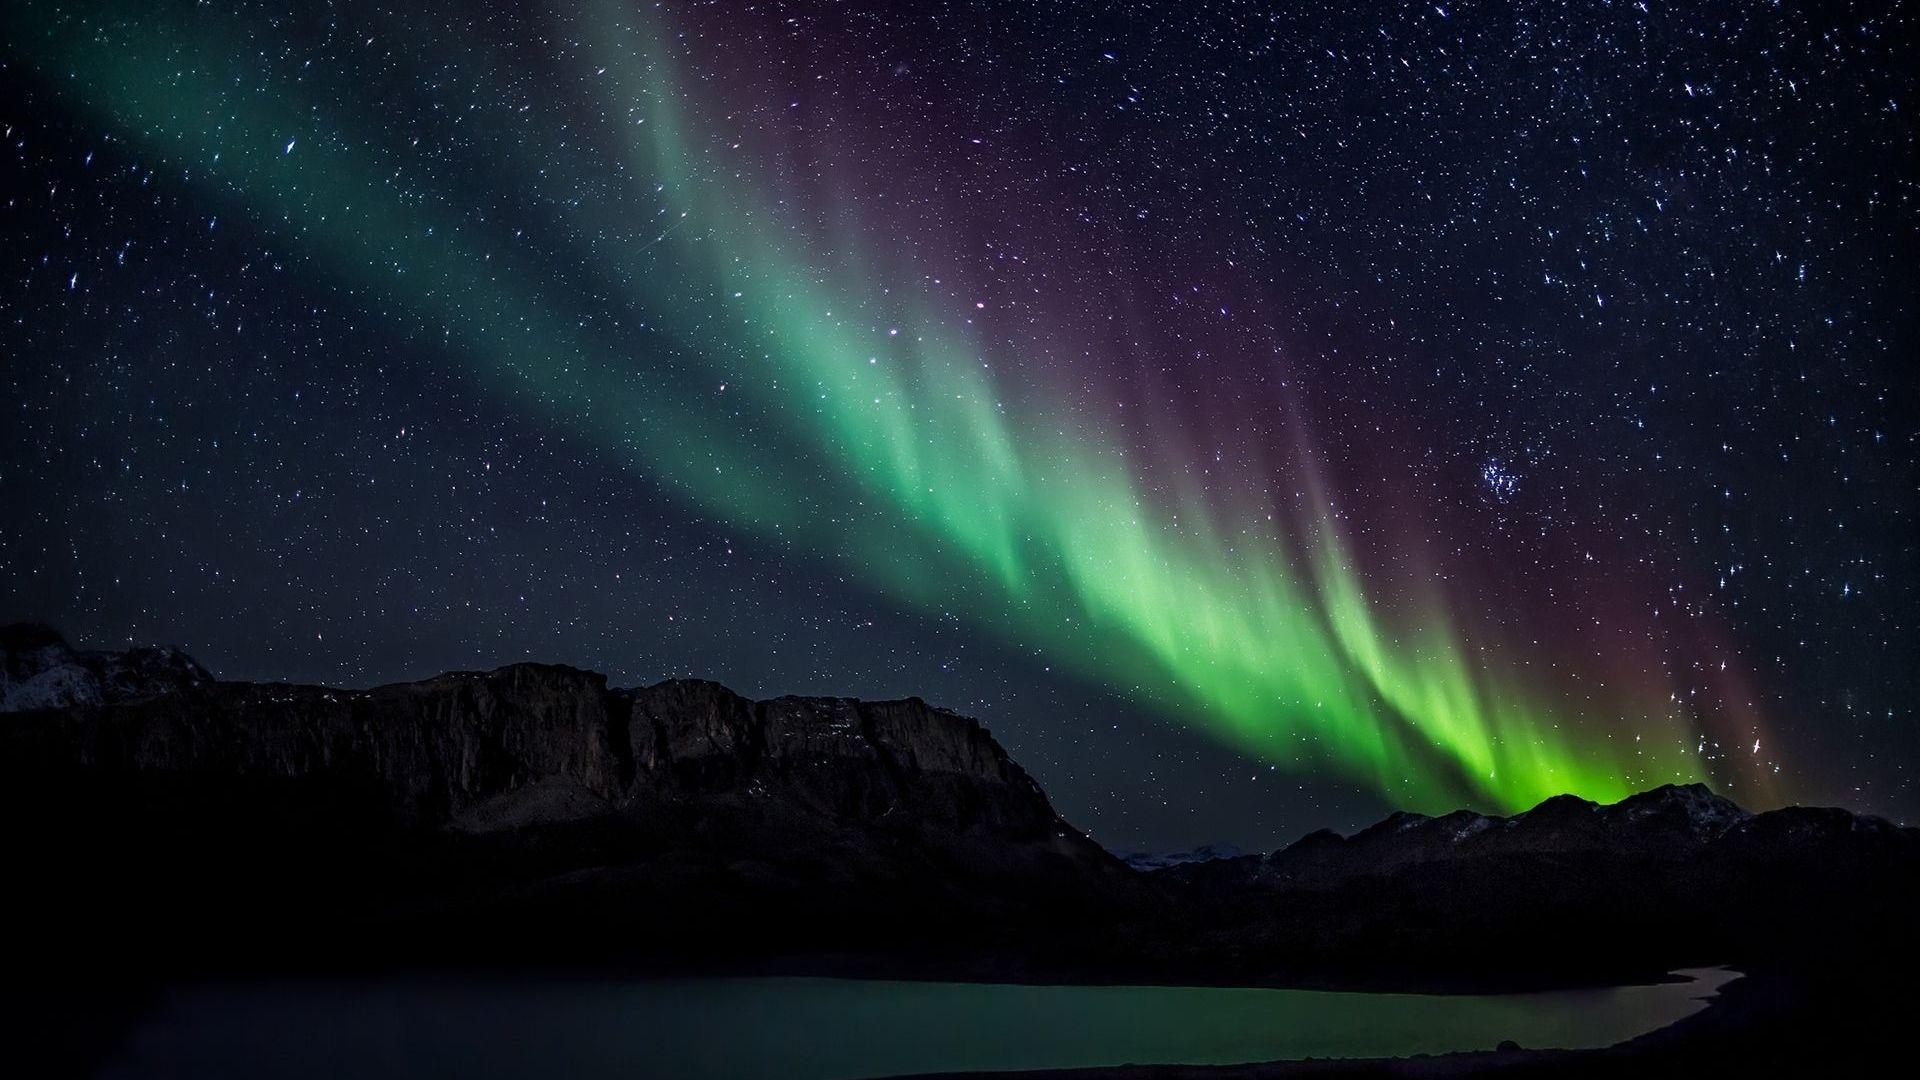 download aurora borealis wallpaper 5077 1920x1080 px high resolution